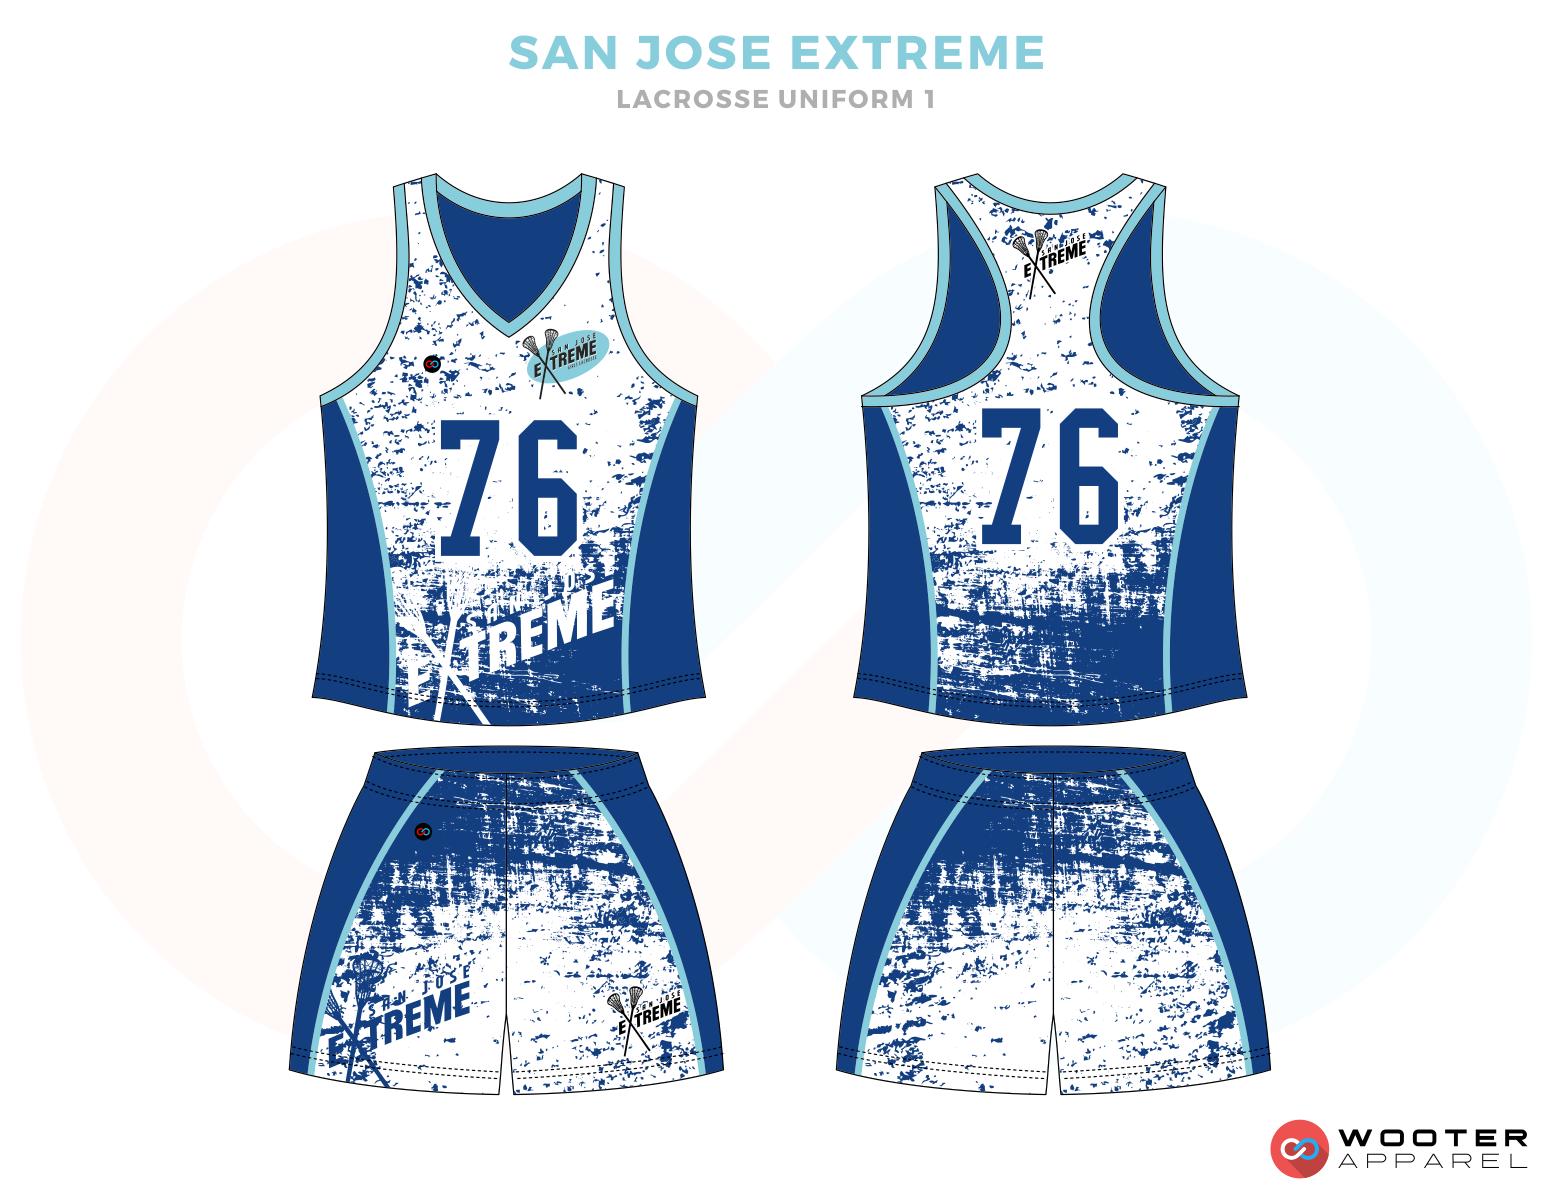 San Jose Blue and White Lacrosse Uniforms, Reversible Pinnies, Jerseys, Shorts